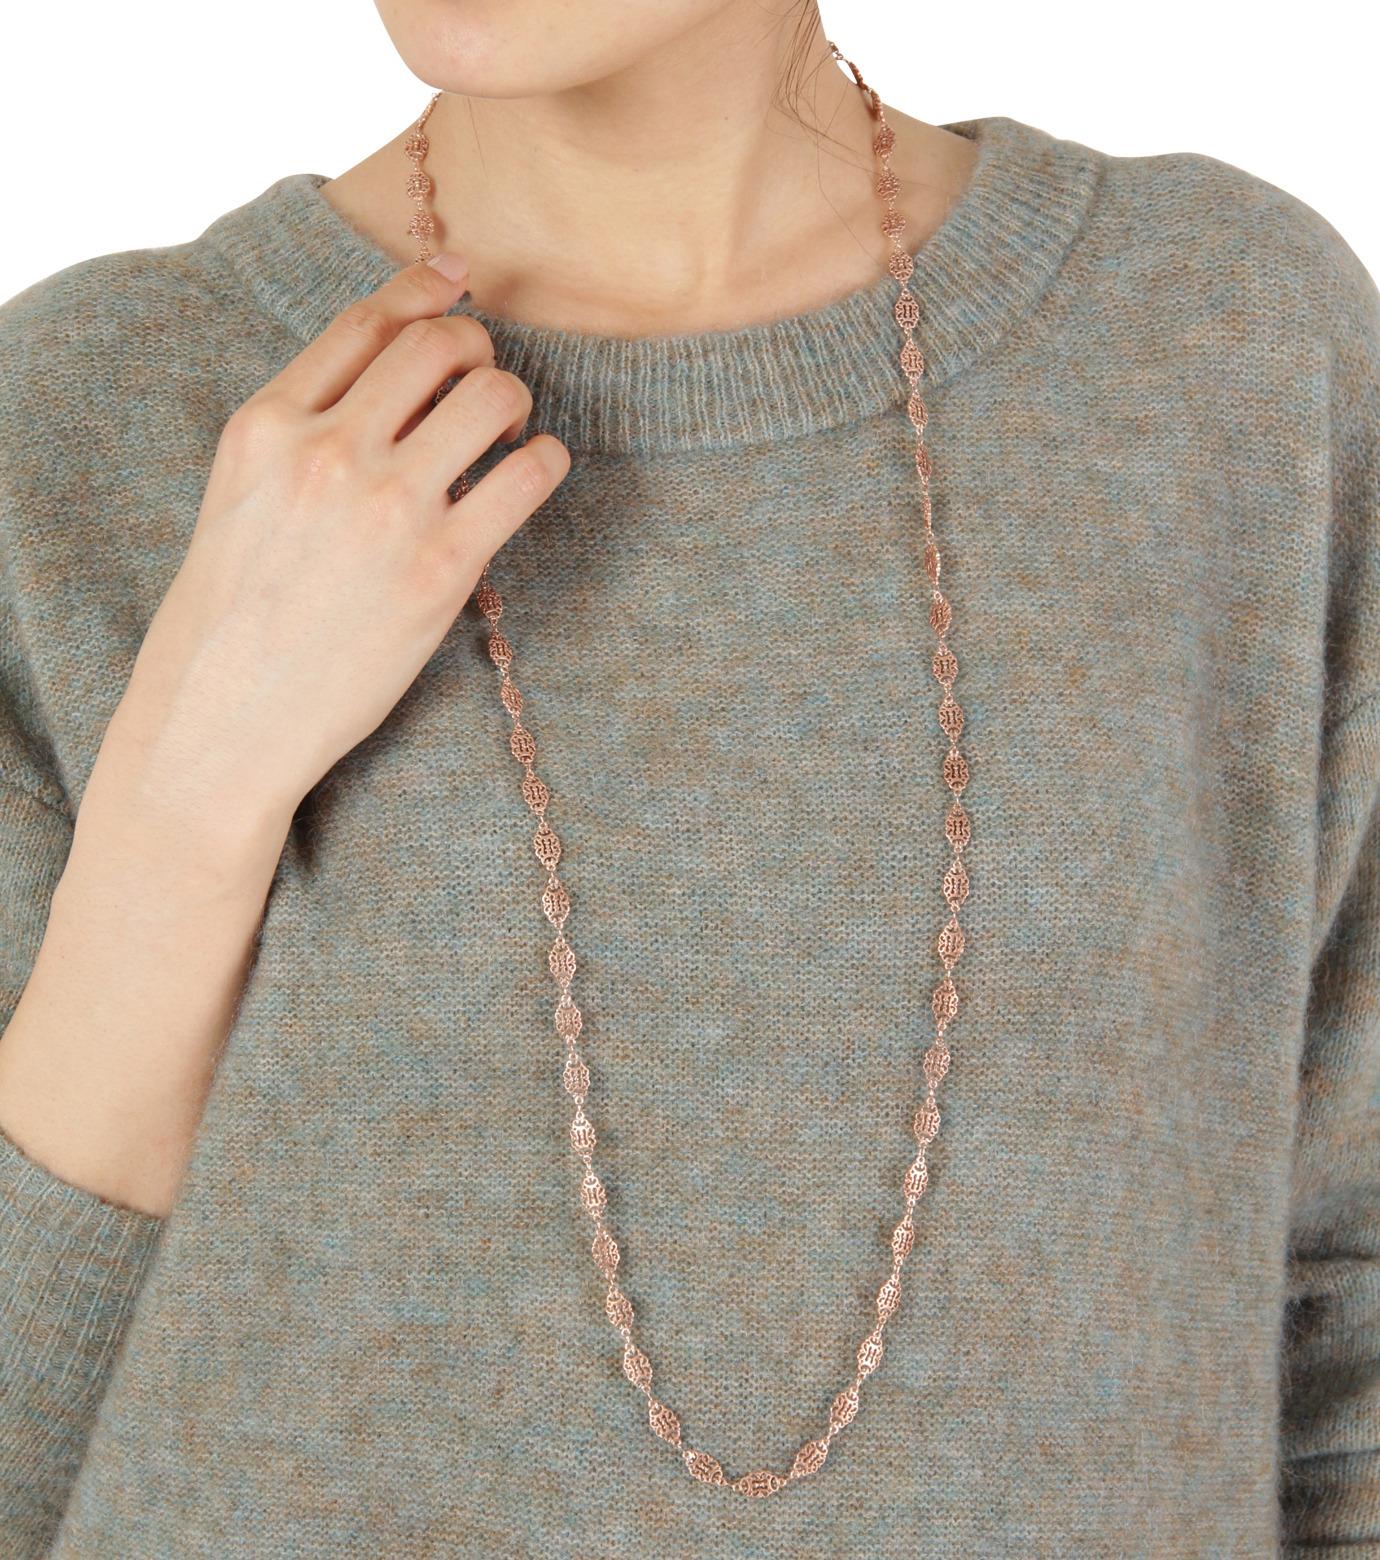 I AM by Ileana Makri(アイ アム バイ イリーナ マクリ)のAntoinette Single Necklace-ROSE(ネックレス/necklace)-O848-62-099-75 拡大詳細画像3